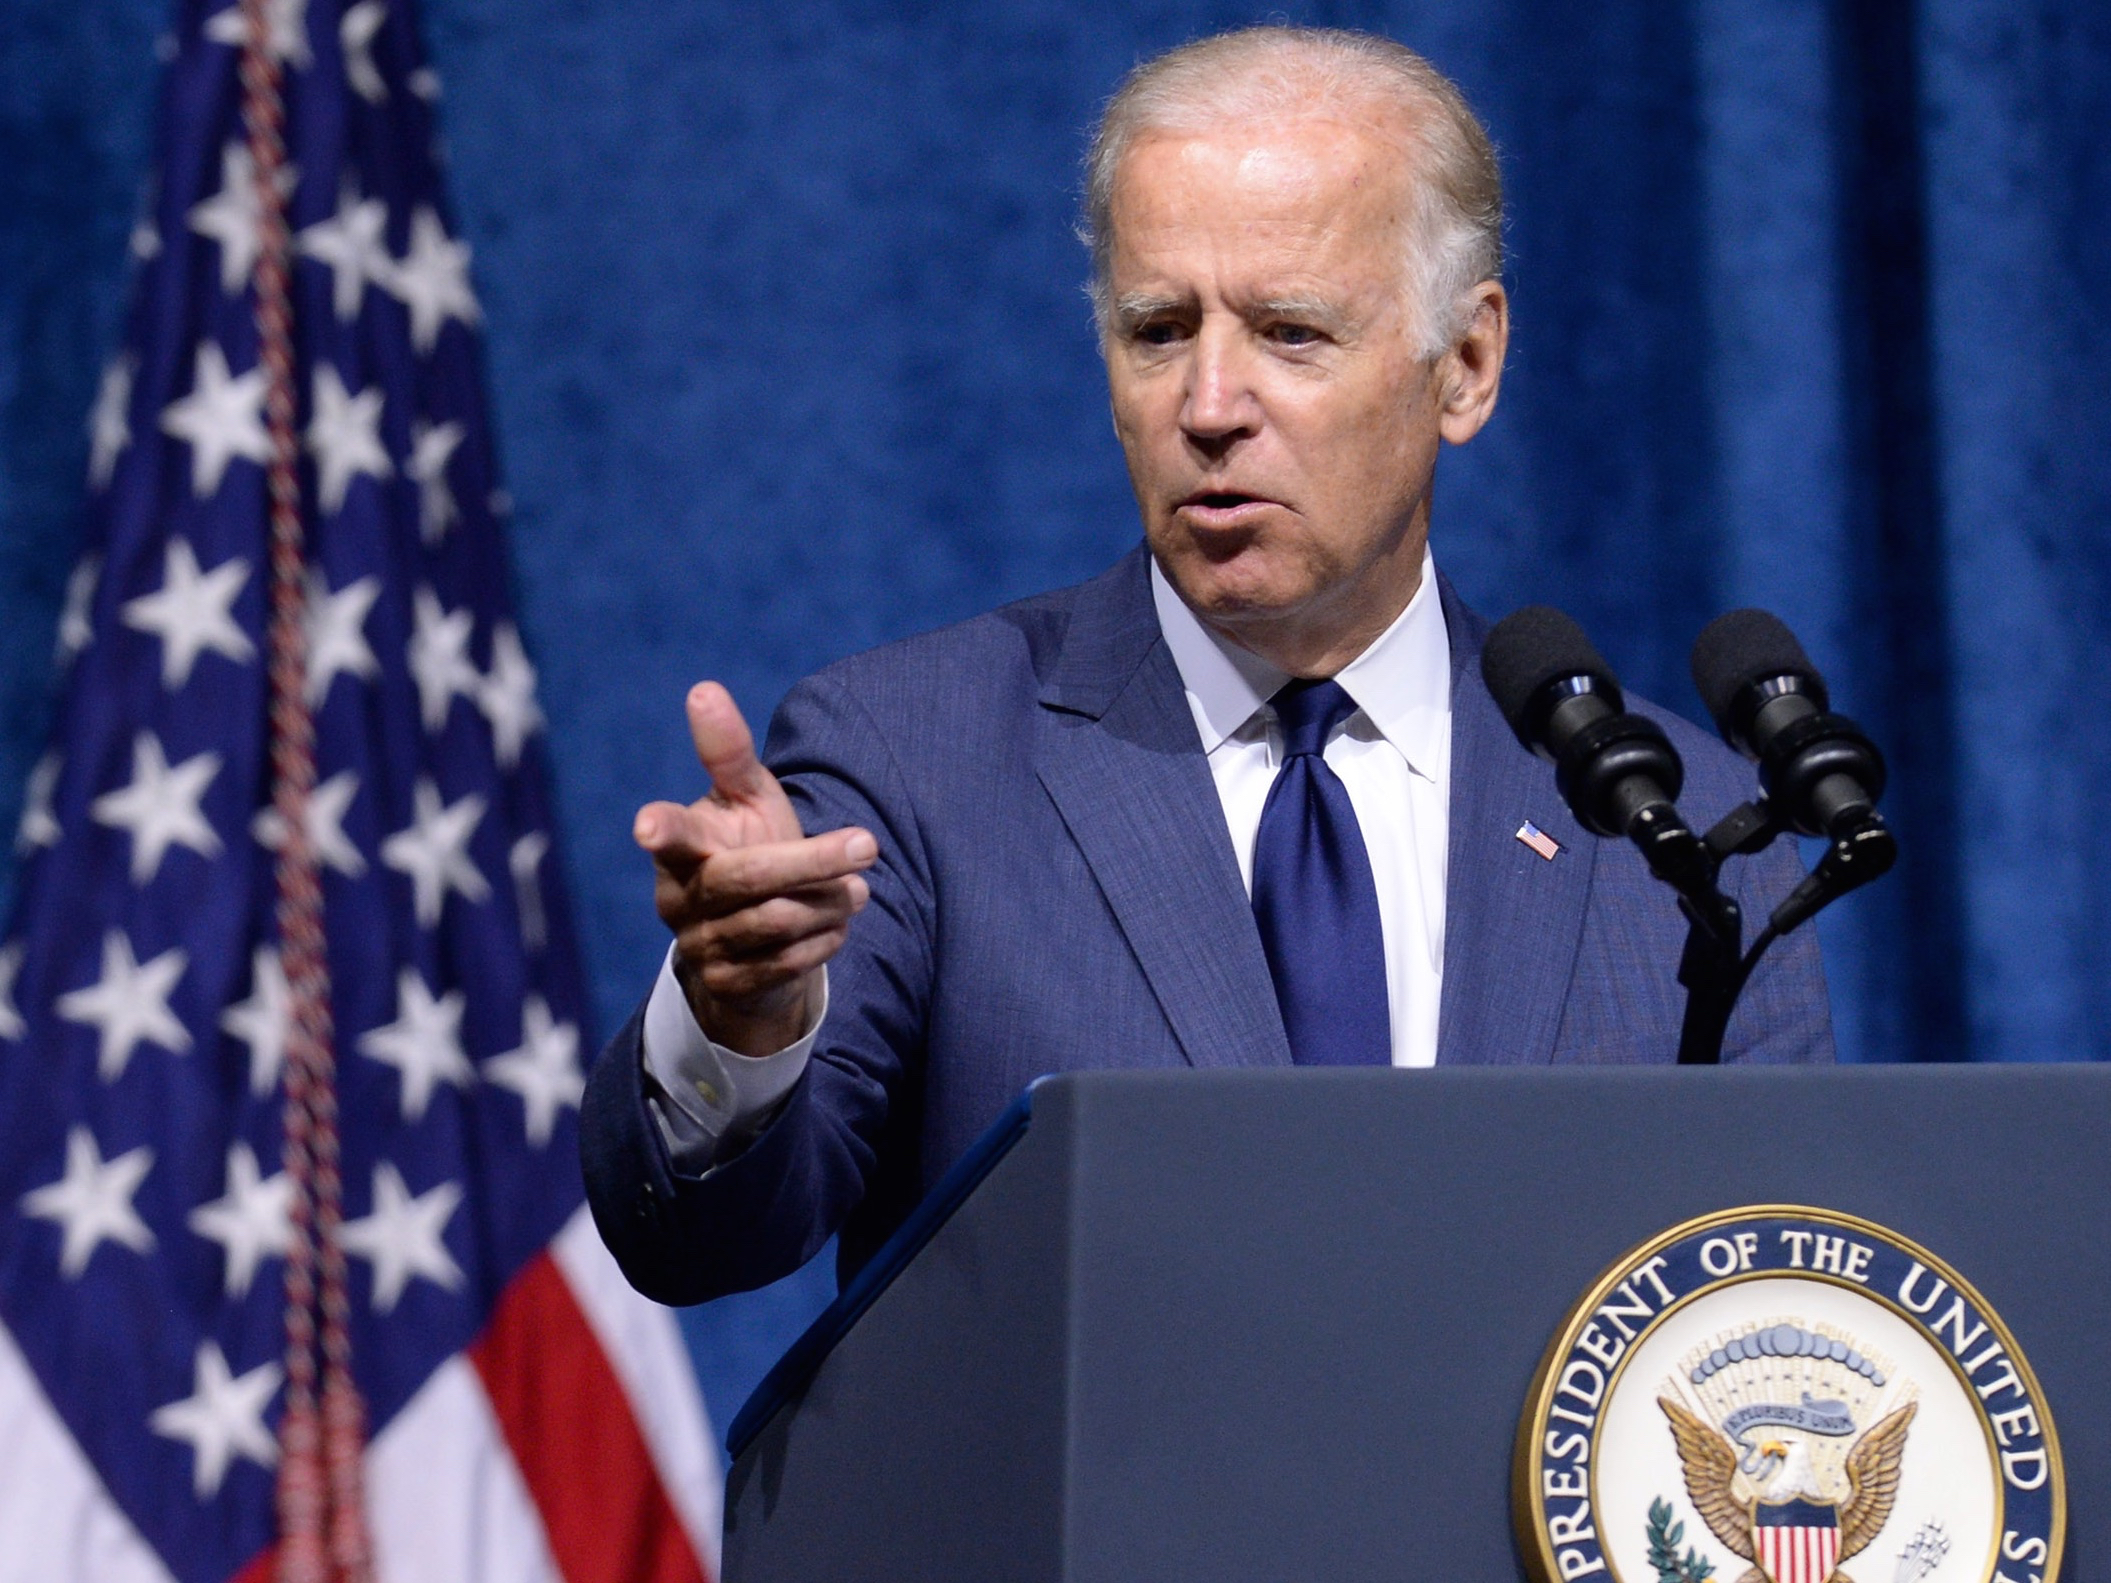 VP Biden And Defense Secretary Carter Attend Memorial Service For Servicemen Killed In Chattanooga Shooting